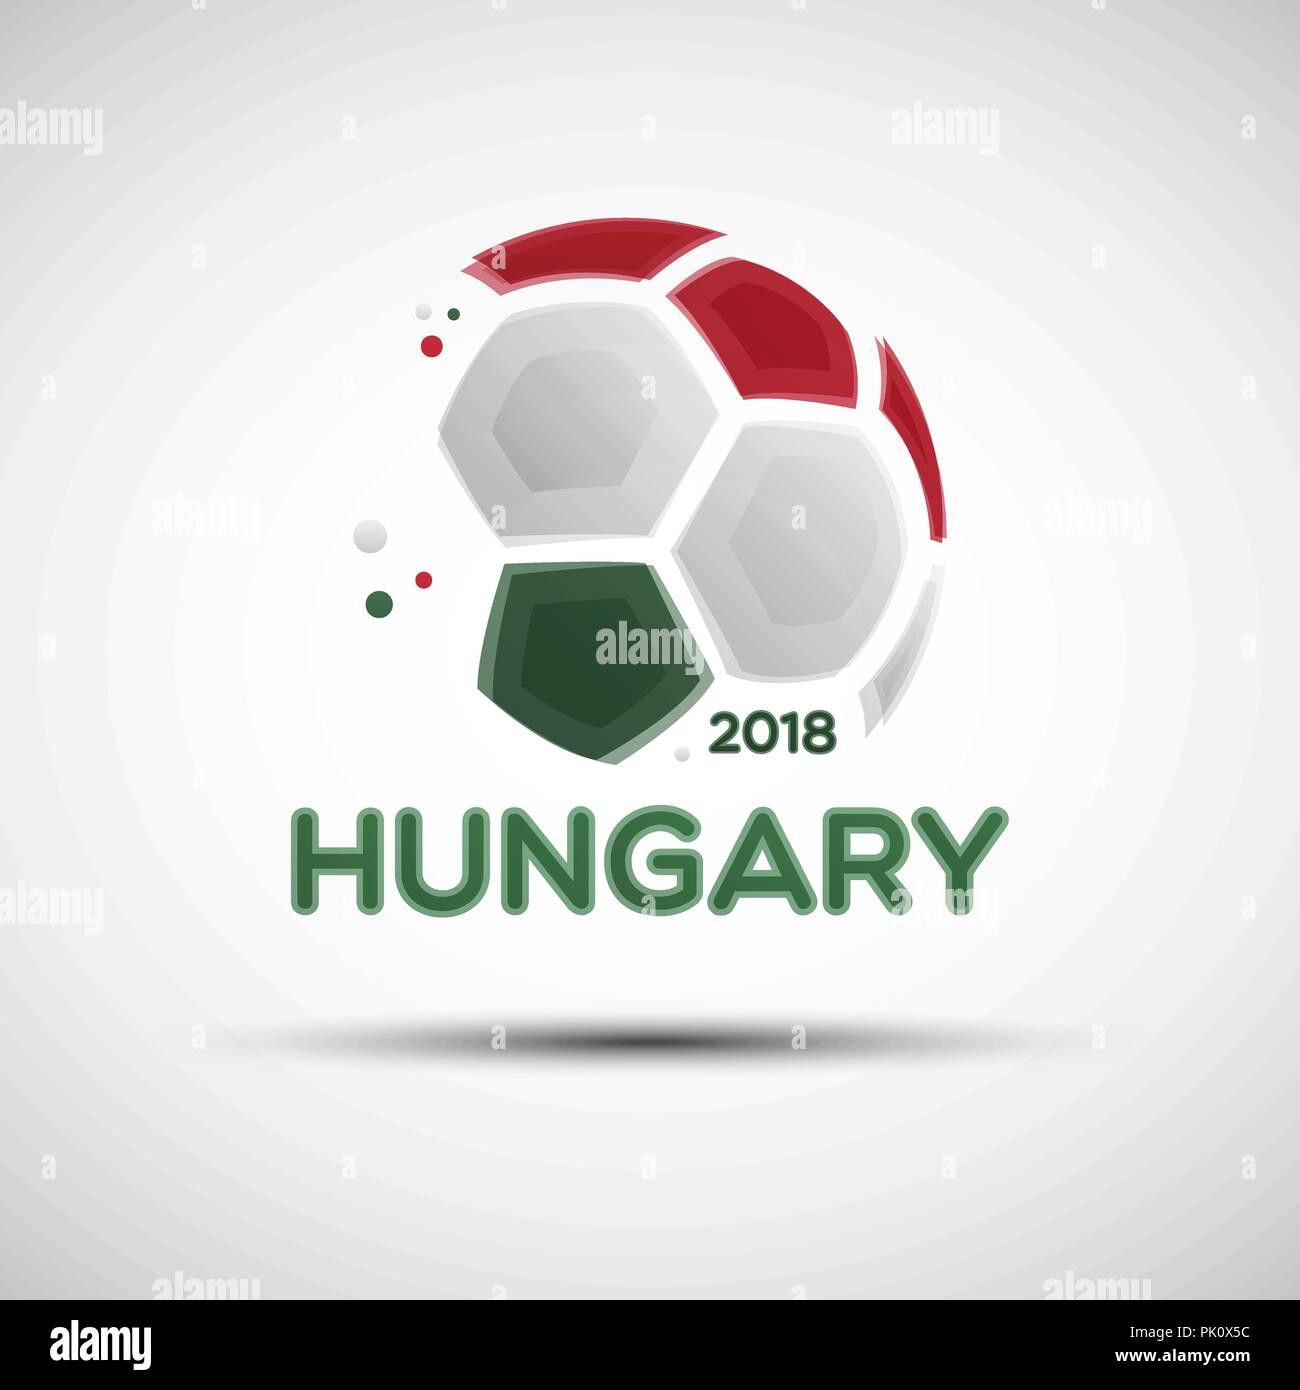 Hungary Football Imágenes De Stockamp; Match QerCWdoExB